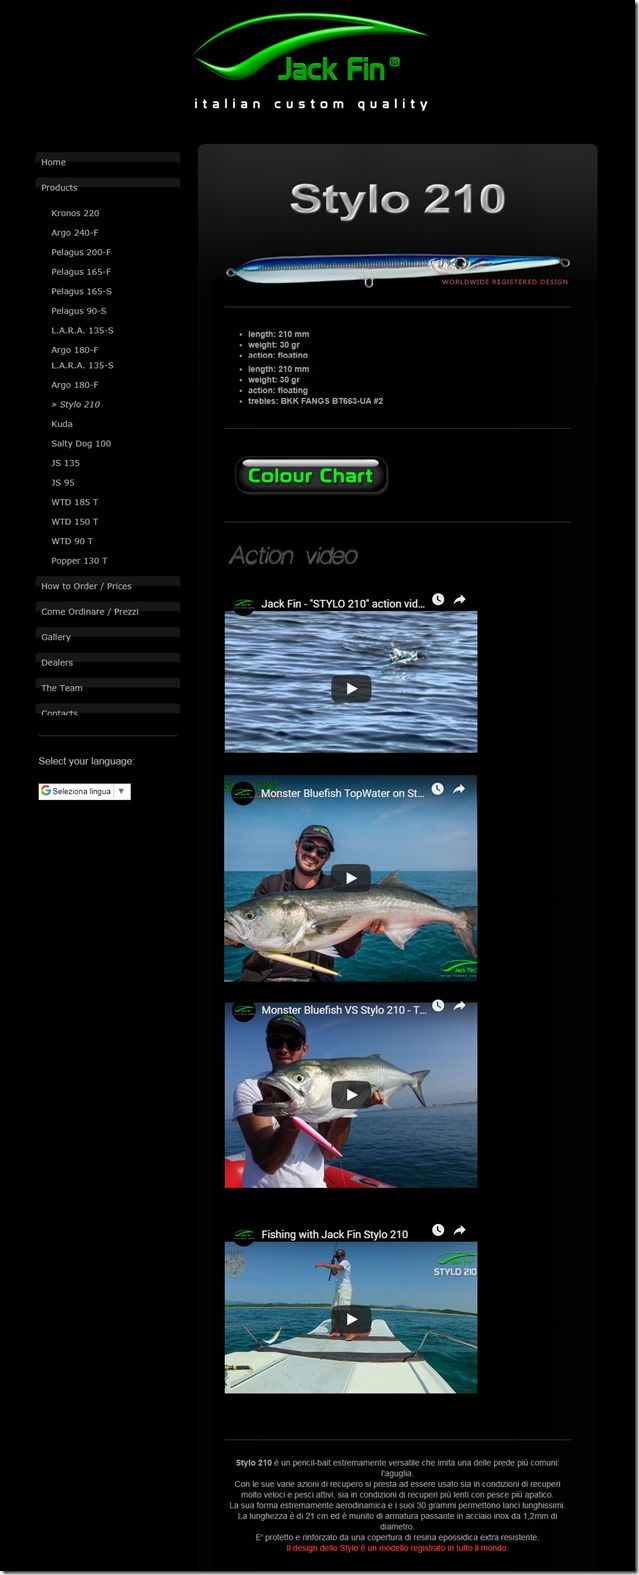 Jack Fin Stylo 210 web site